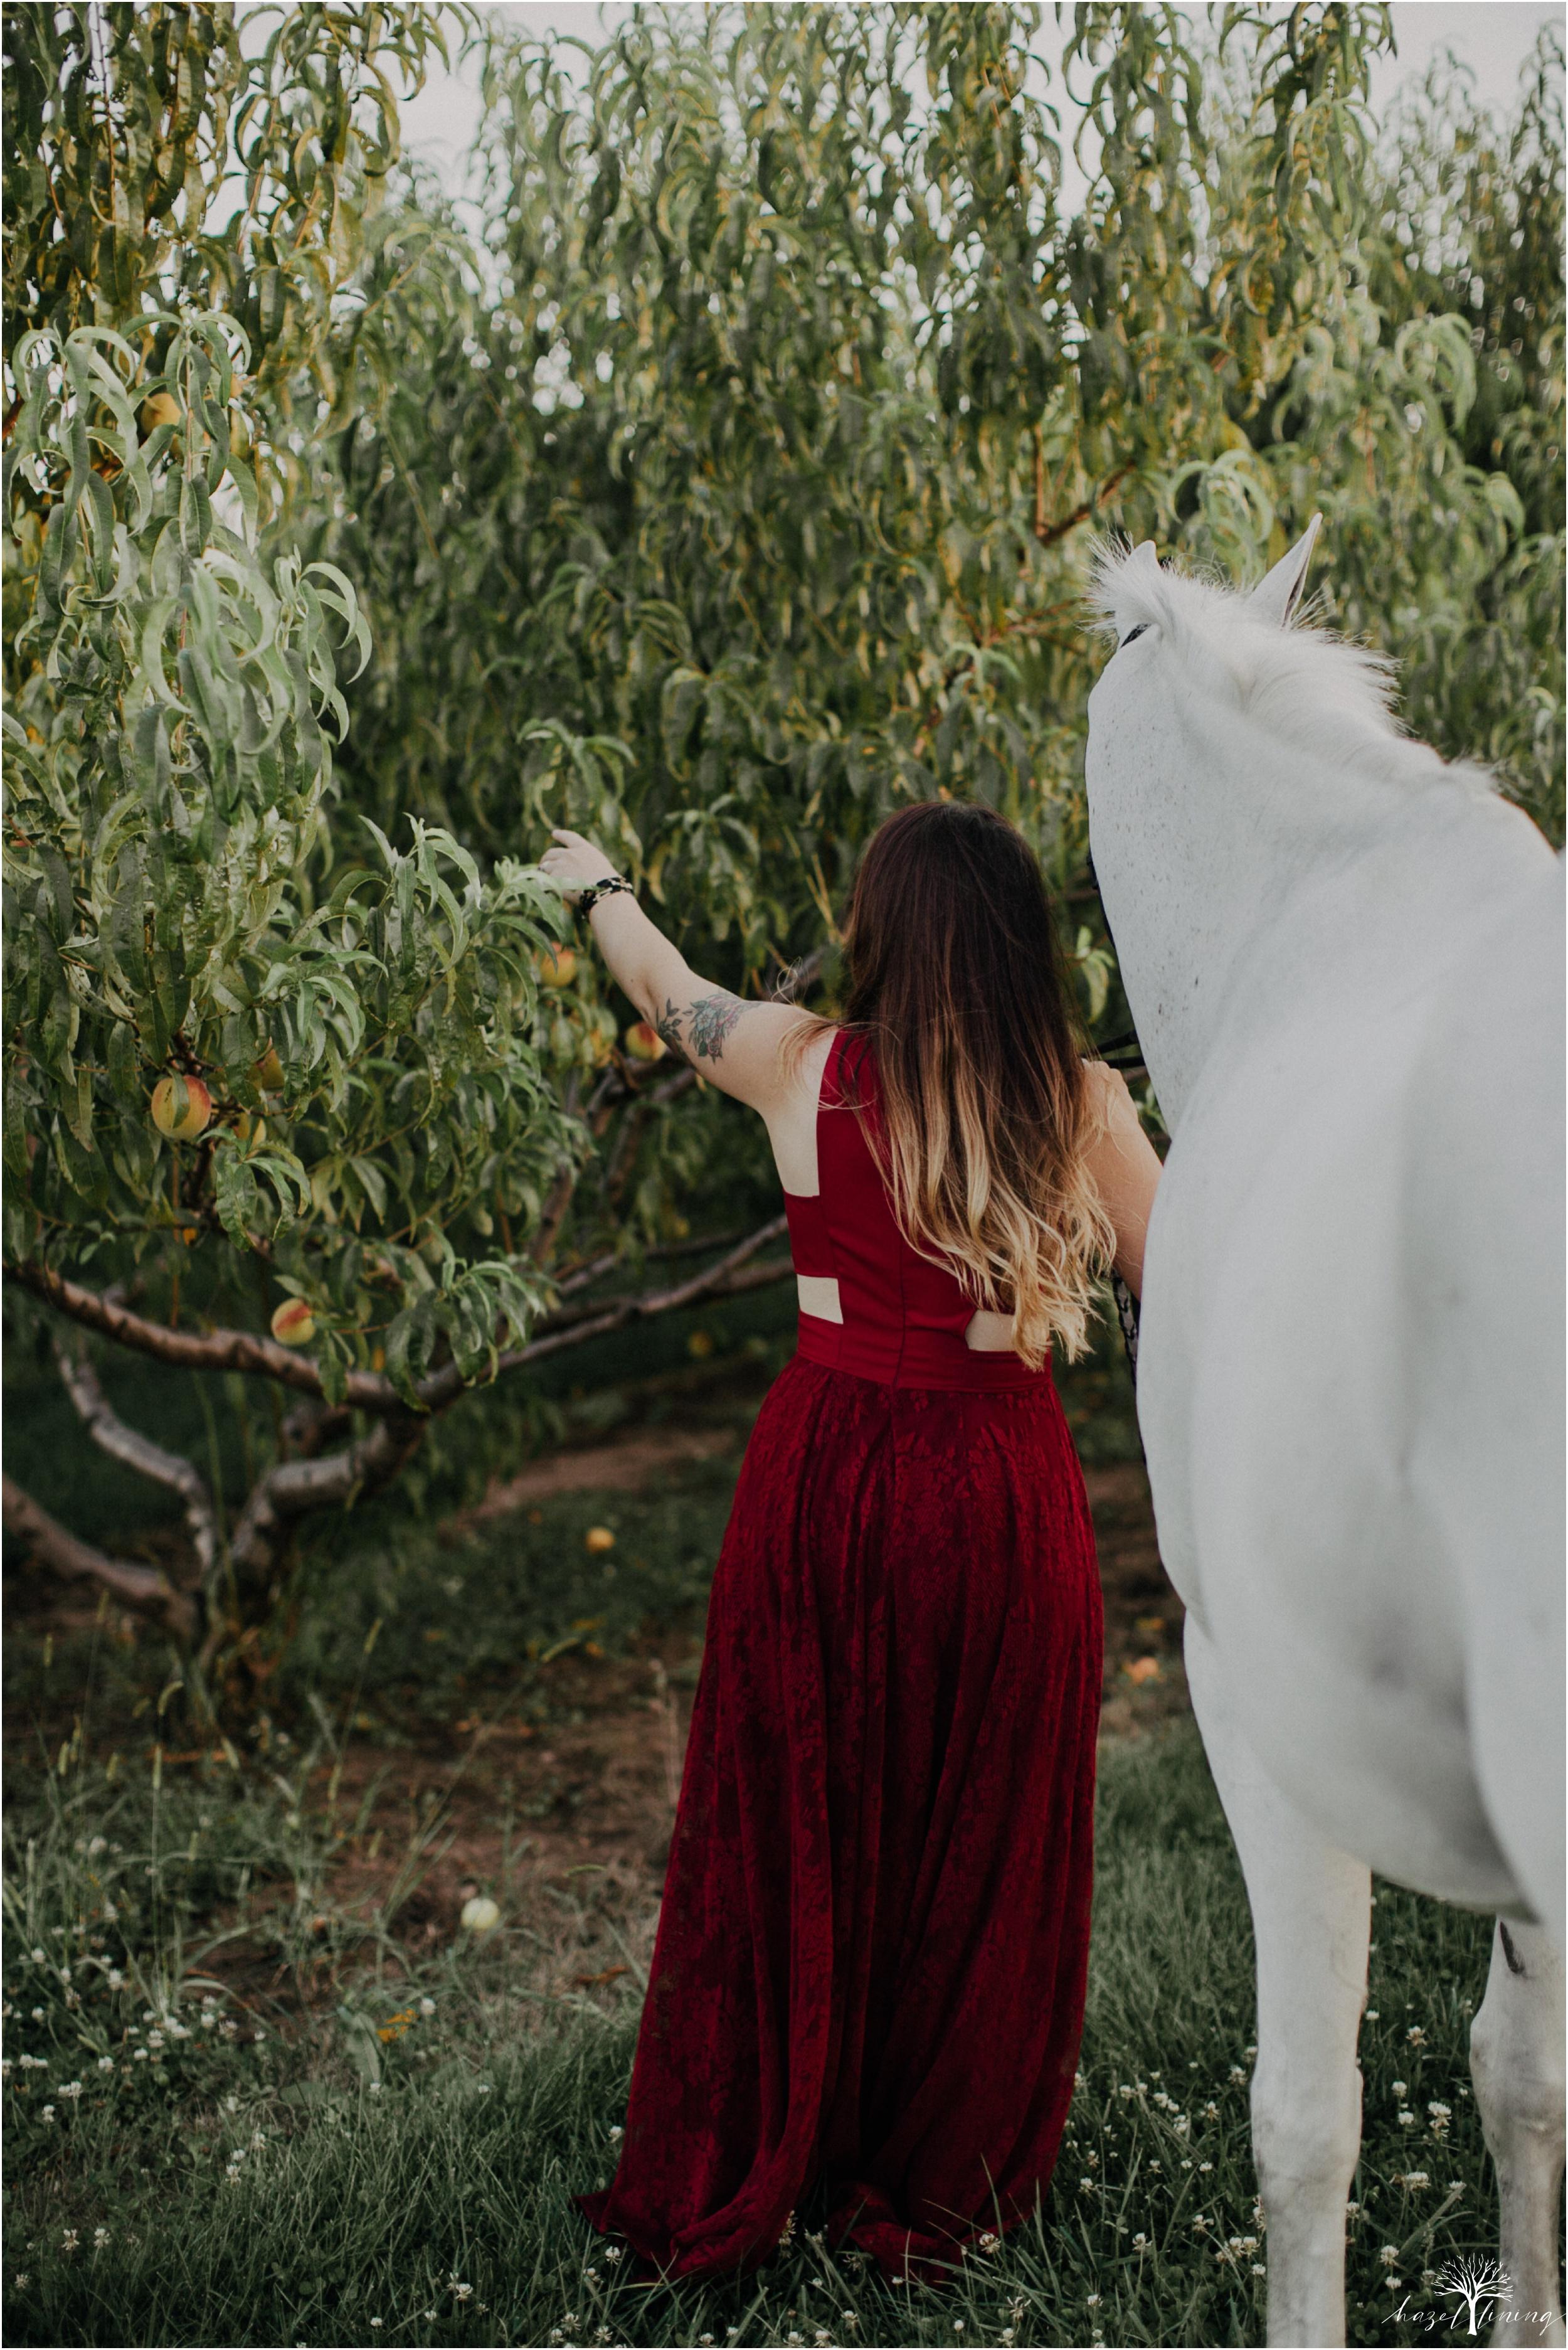 taylor-adams-and-horse-delaware-valley-university-delval-summer-equestrian-portrait-session-hazel-lining-photography-destination-elopement-wedding-engagement-photography_0041.jpg